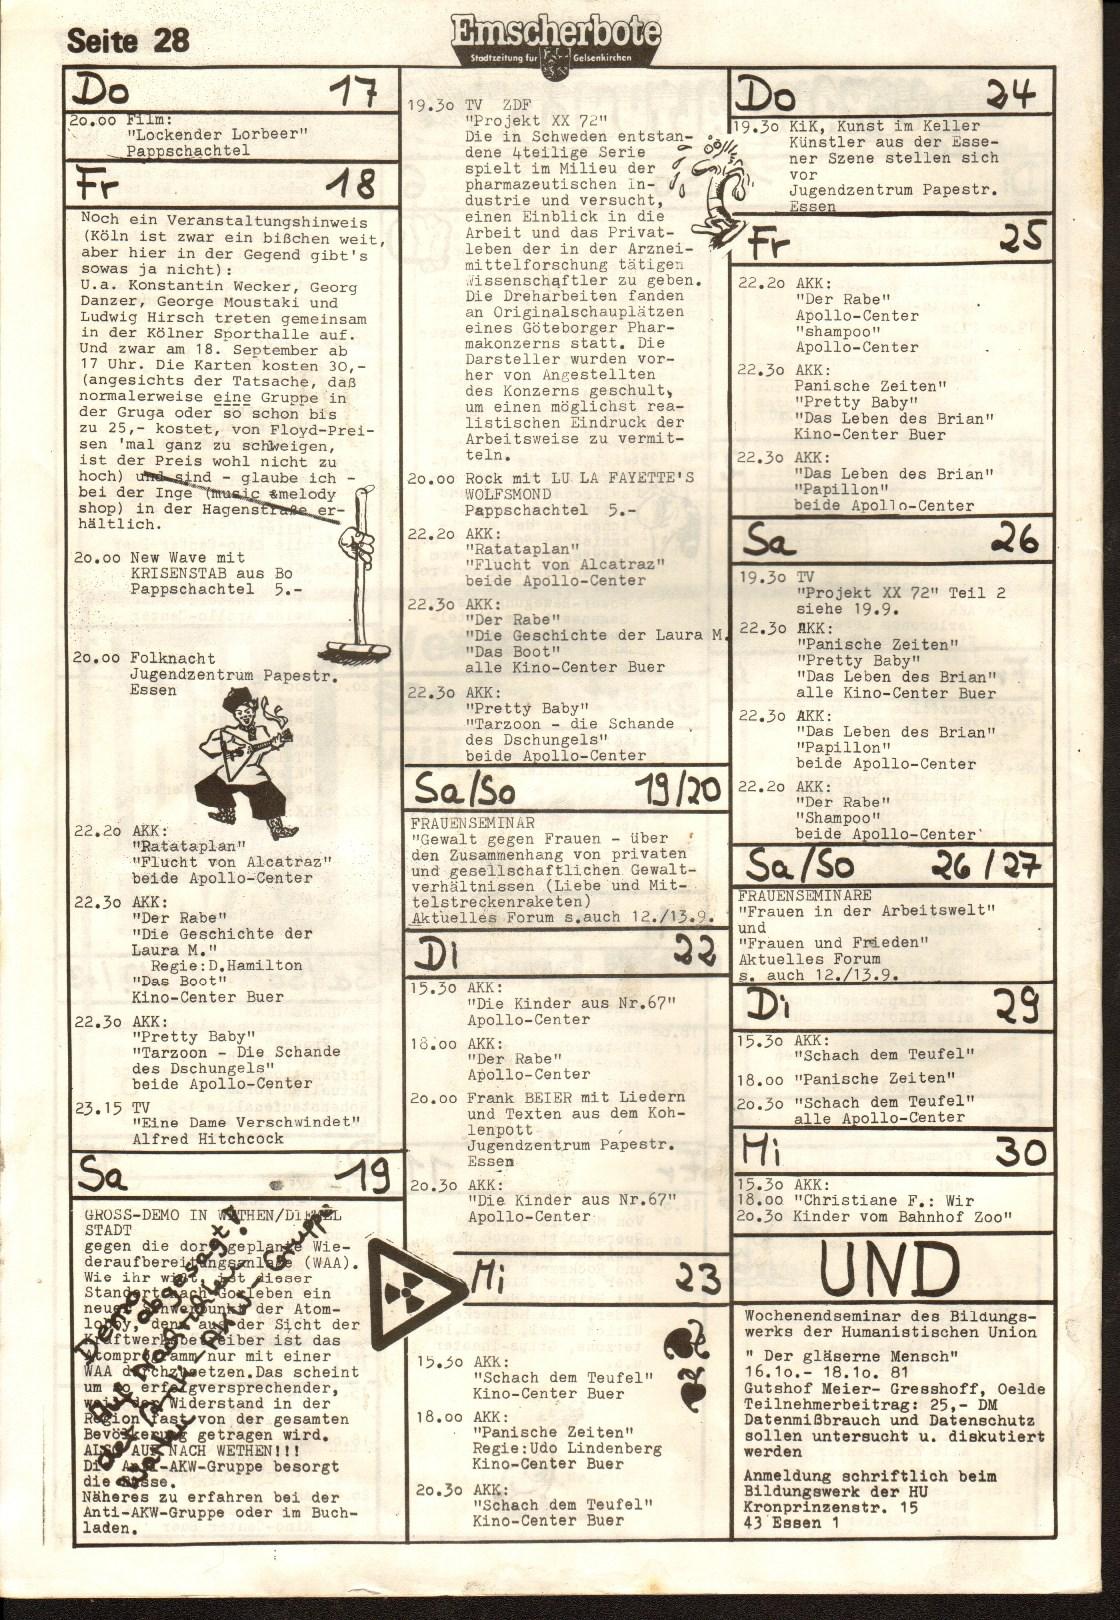 Gelsenkirchen_Emscherbote_1981_10_28